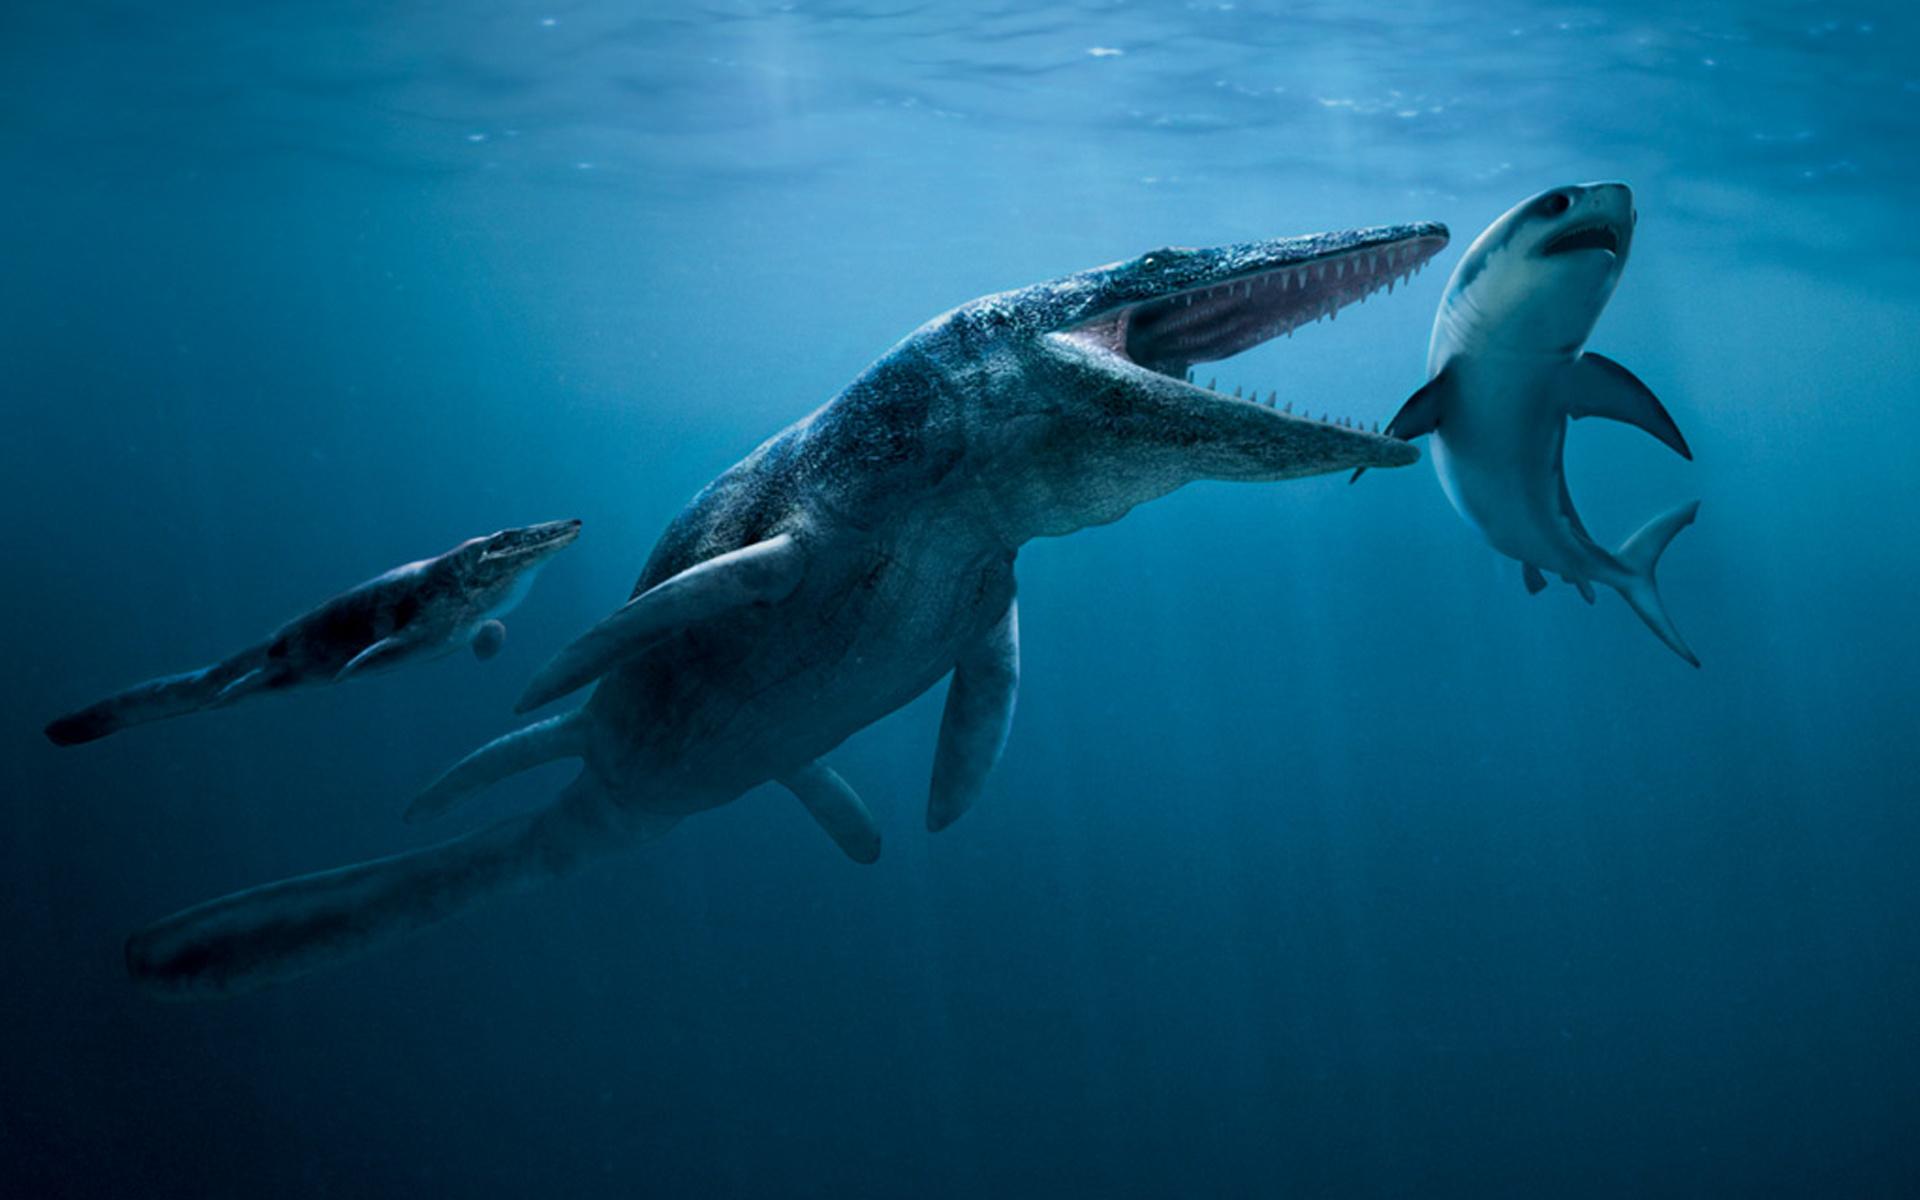 dinosaur designs reptiles awesome dinosaurs prehistoric ocean full 1920x1200